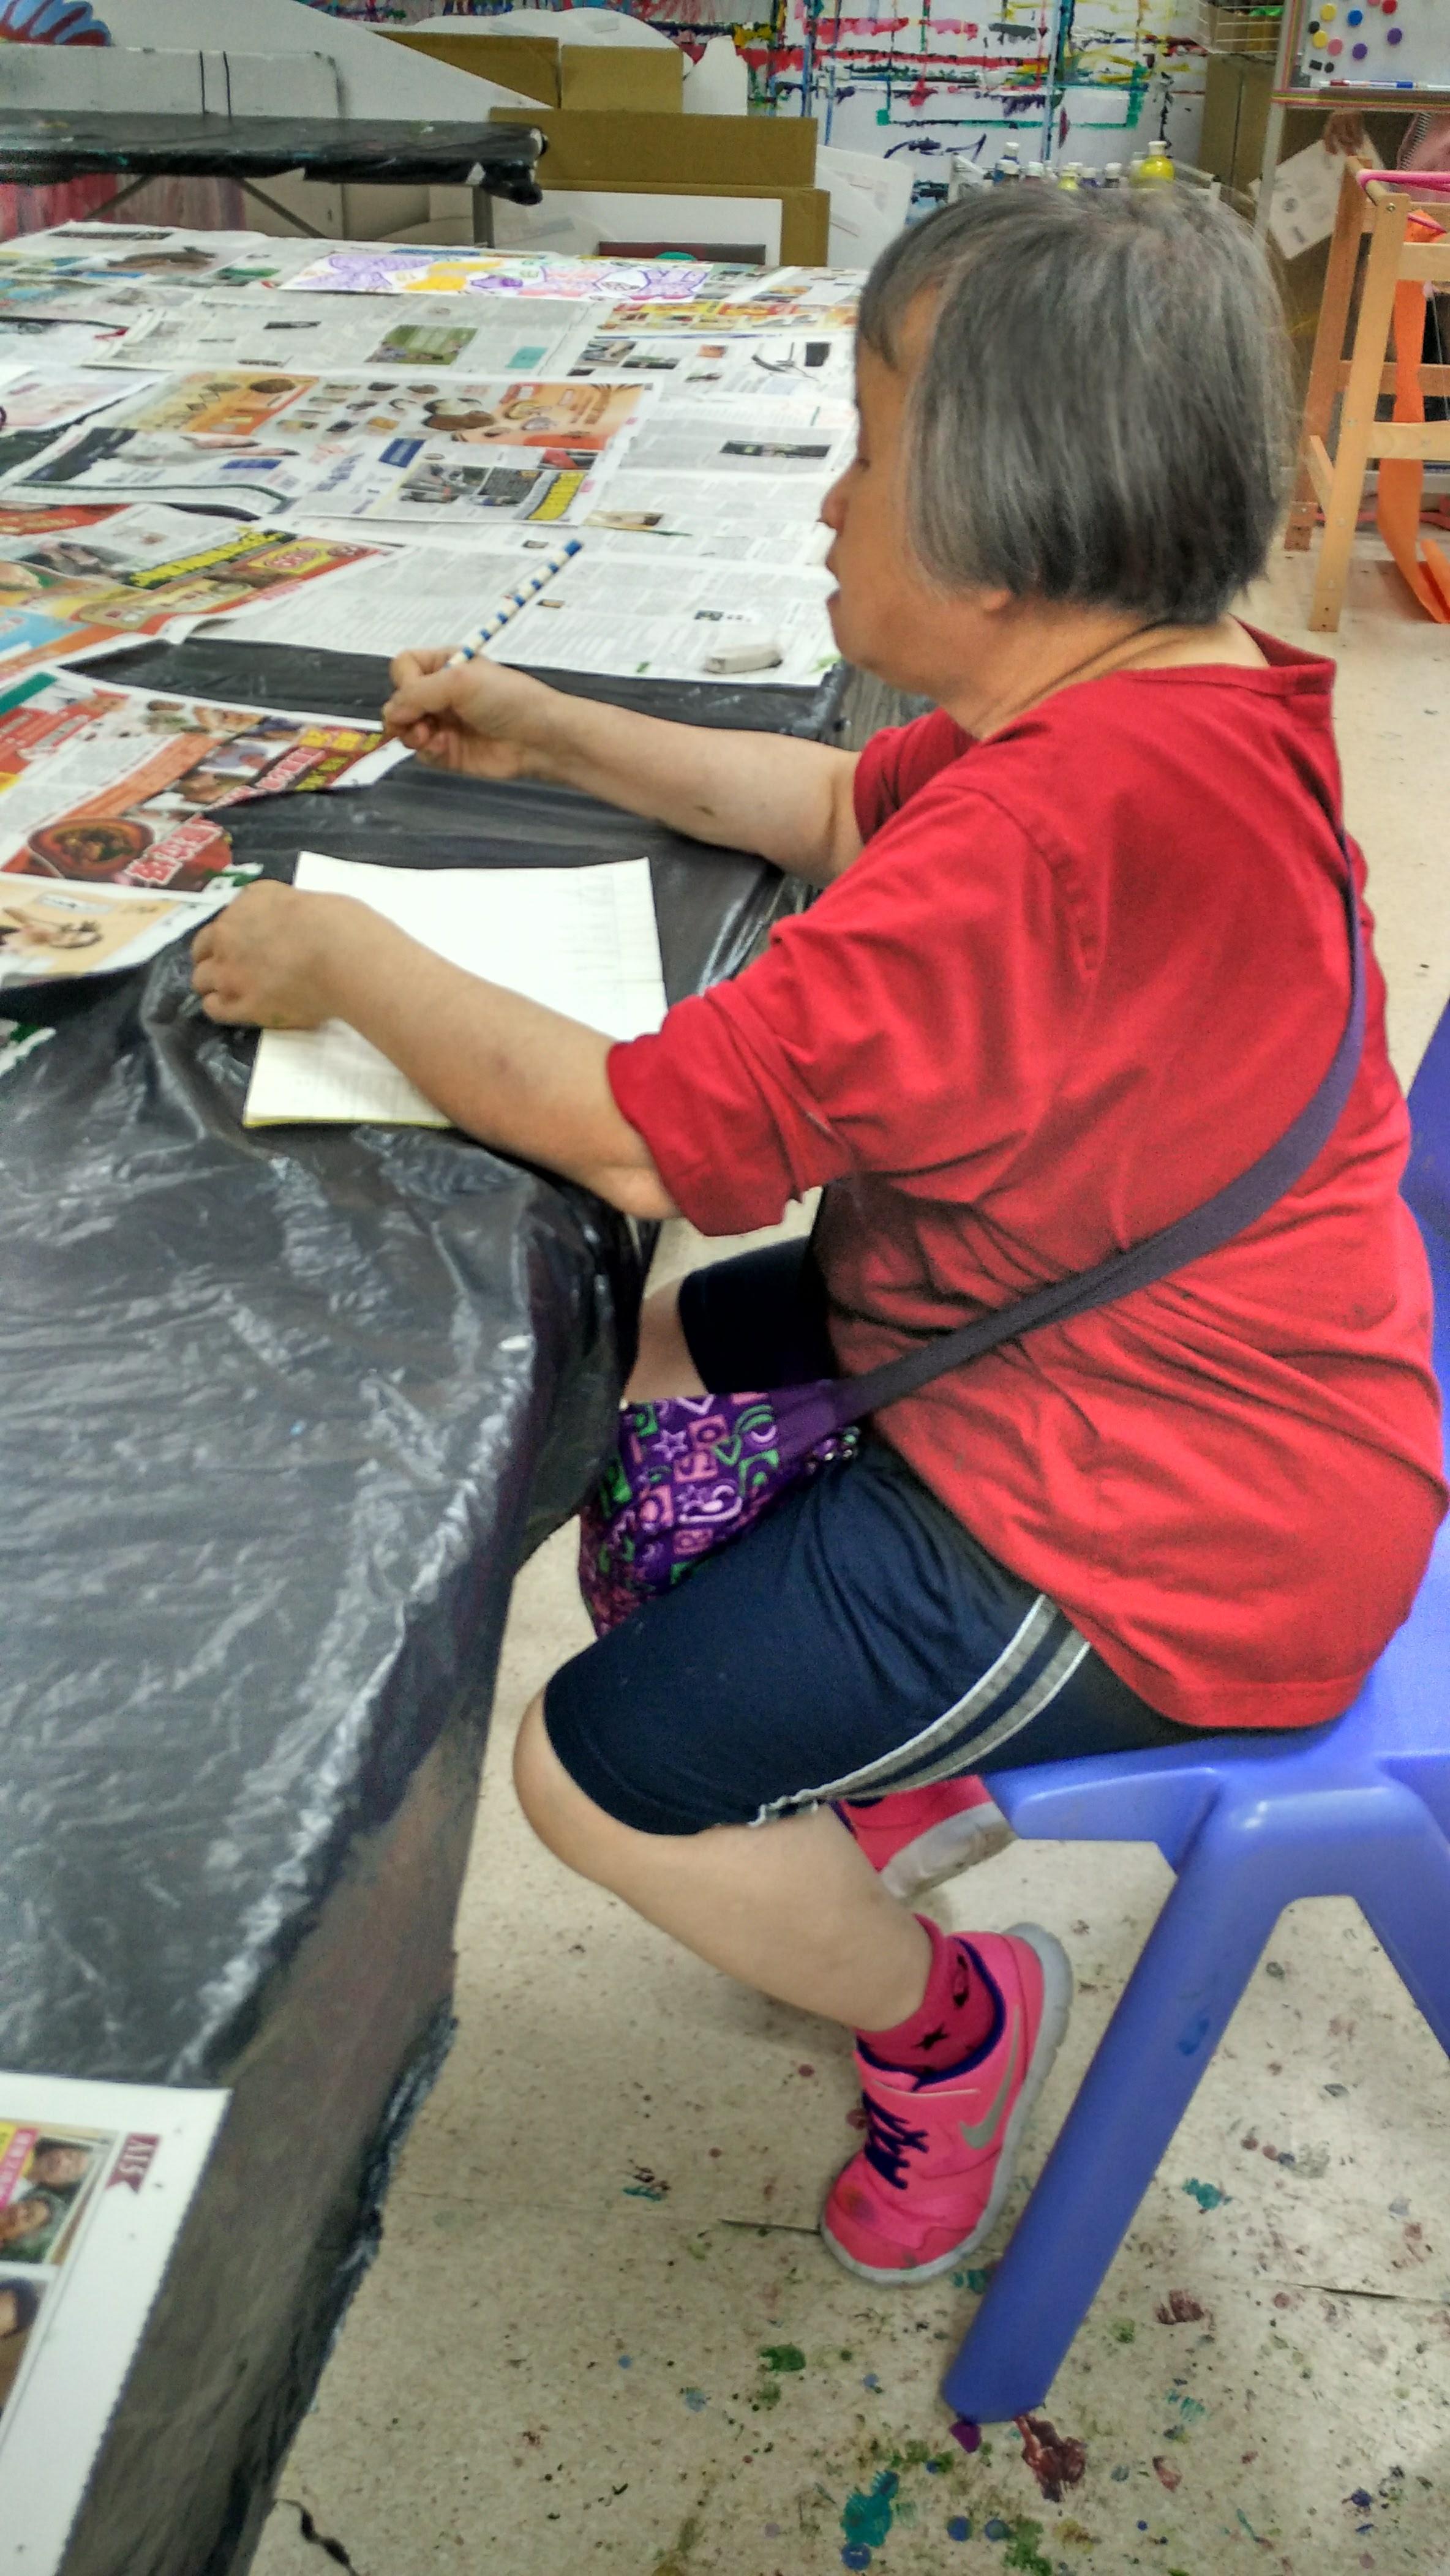 Artist of i-dArt at work